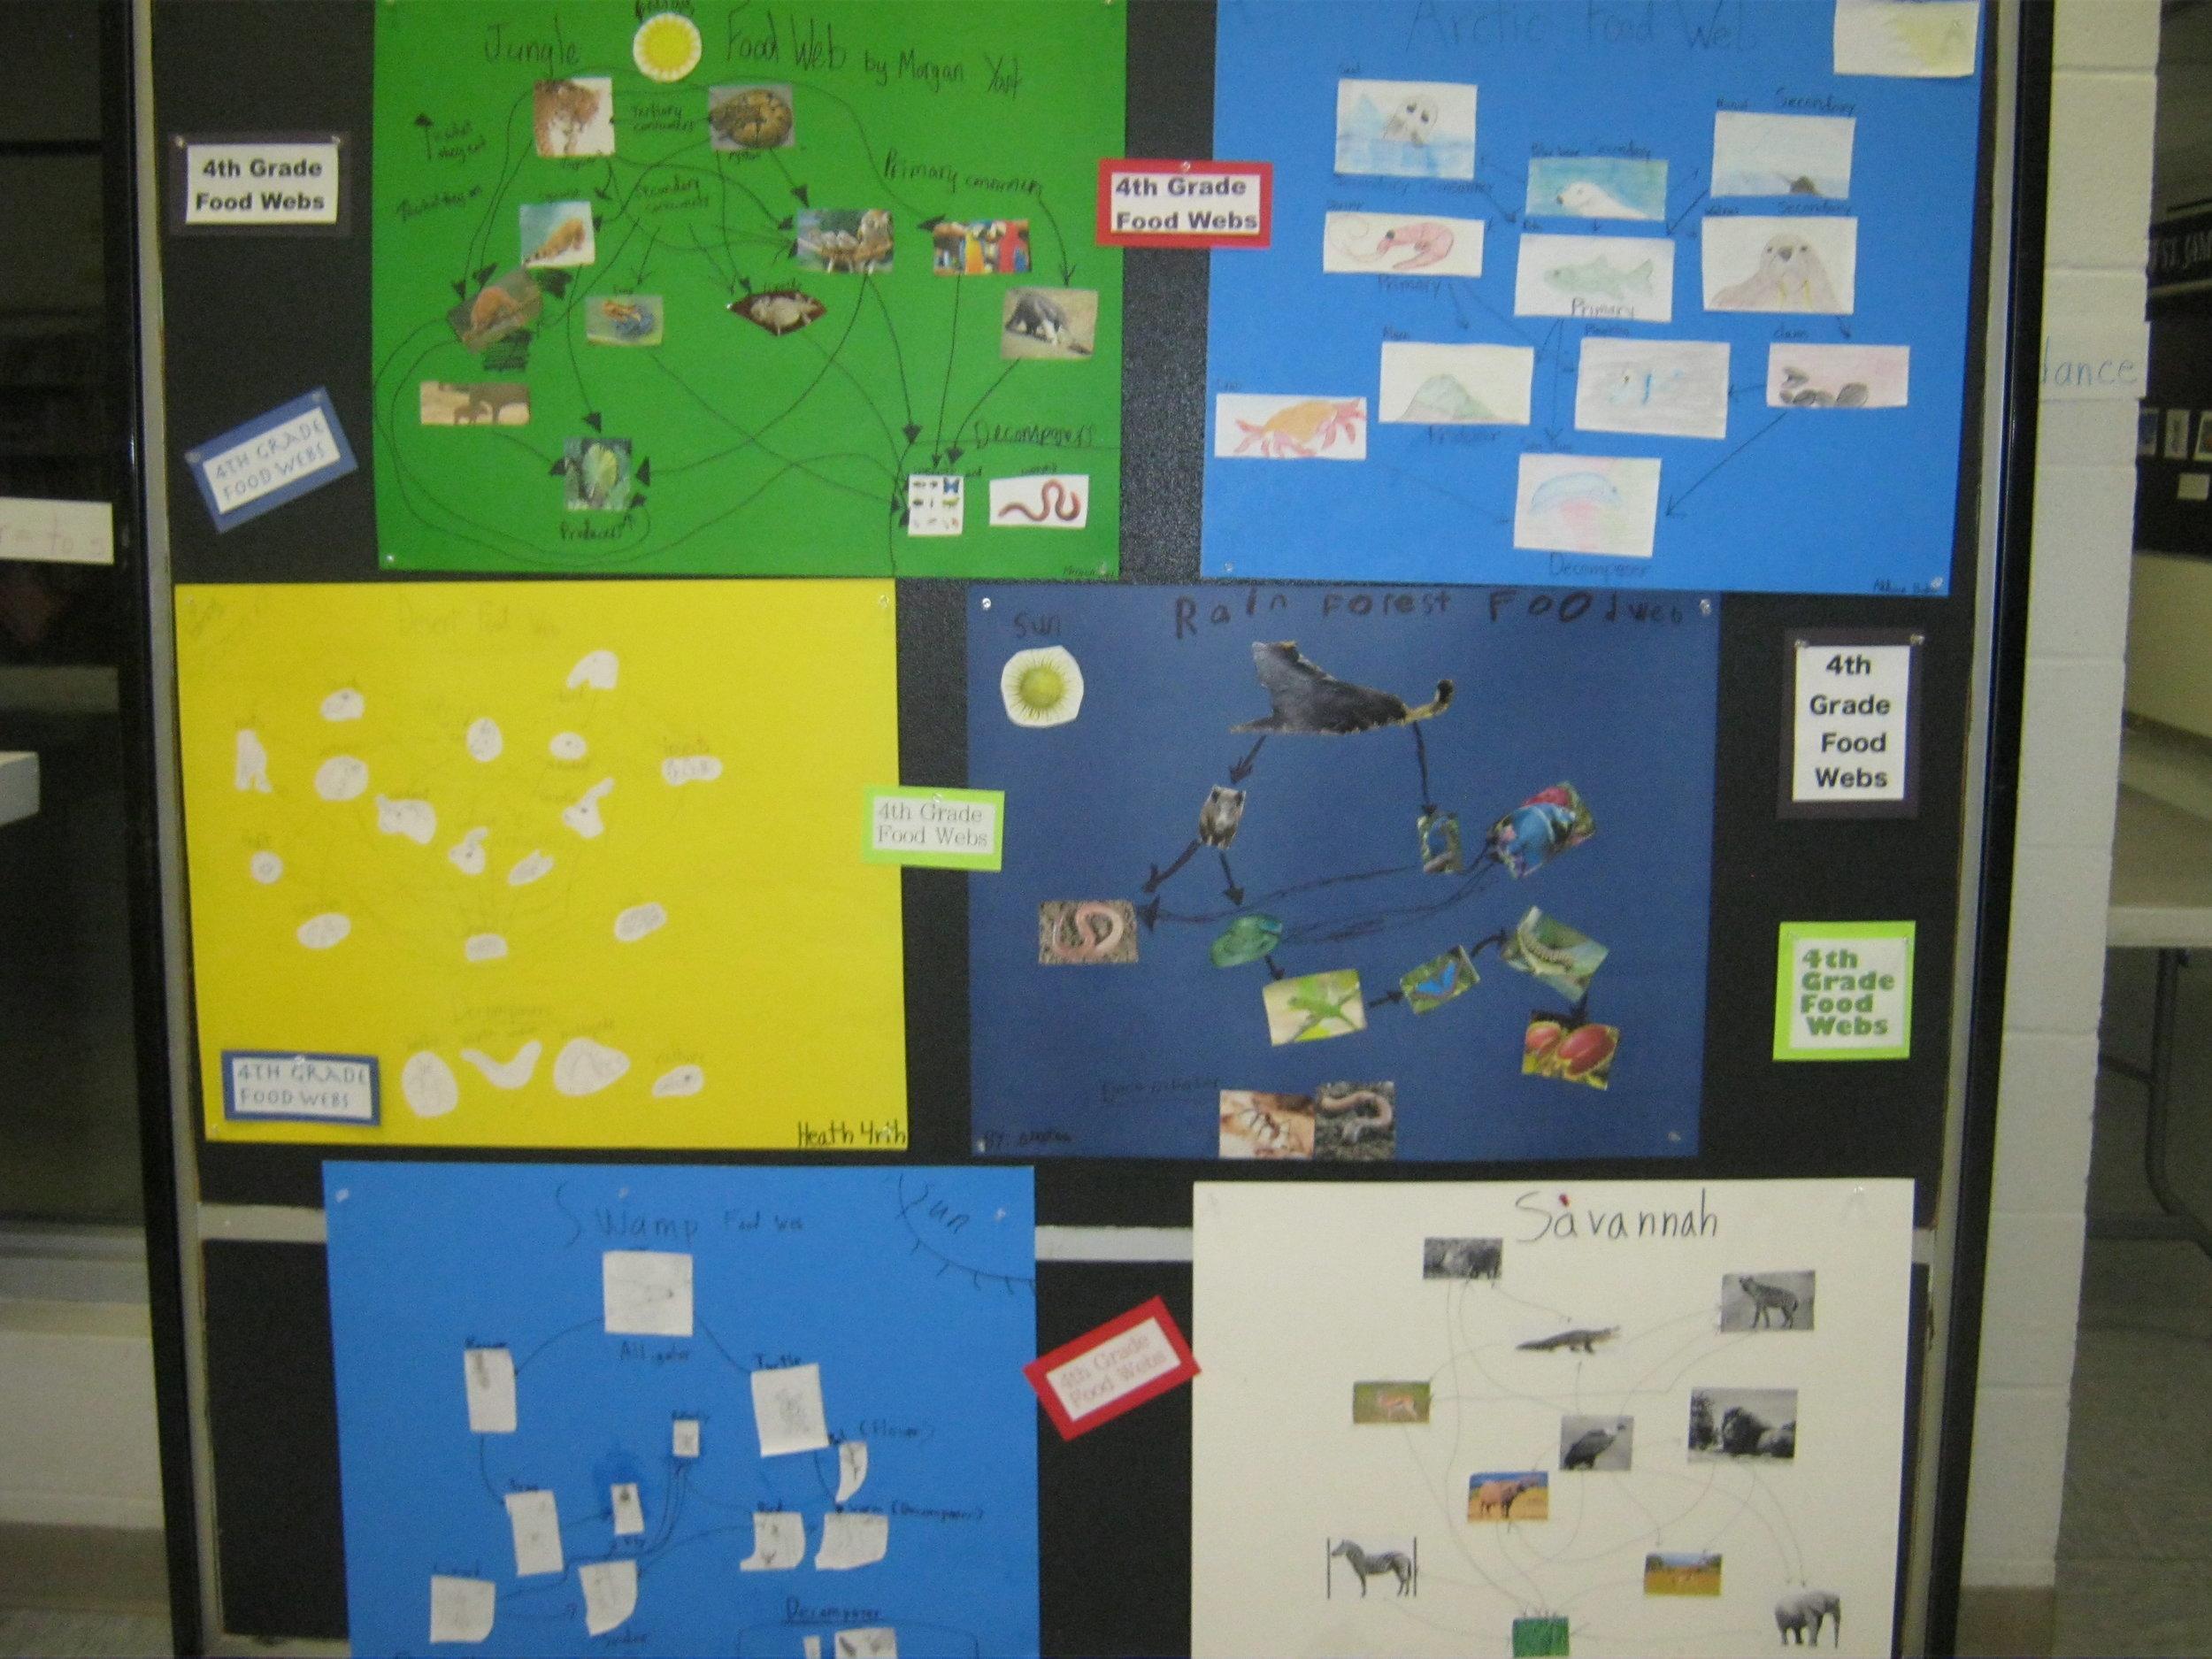 Some 4th Grade Food Webs